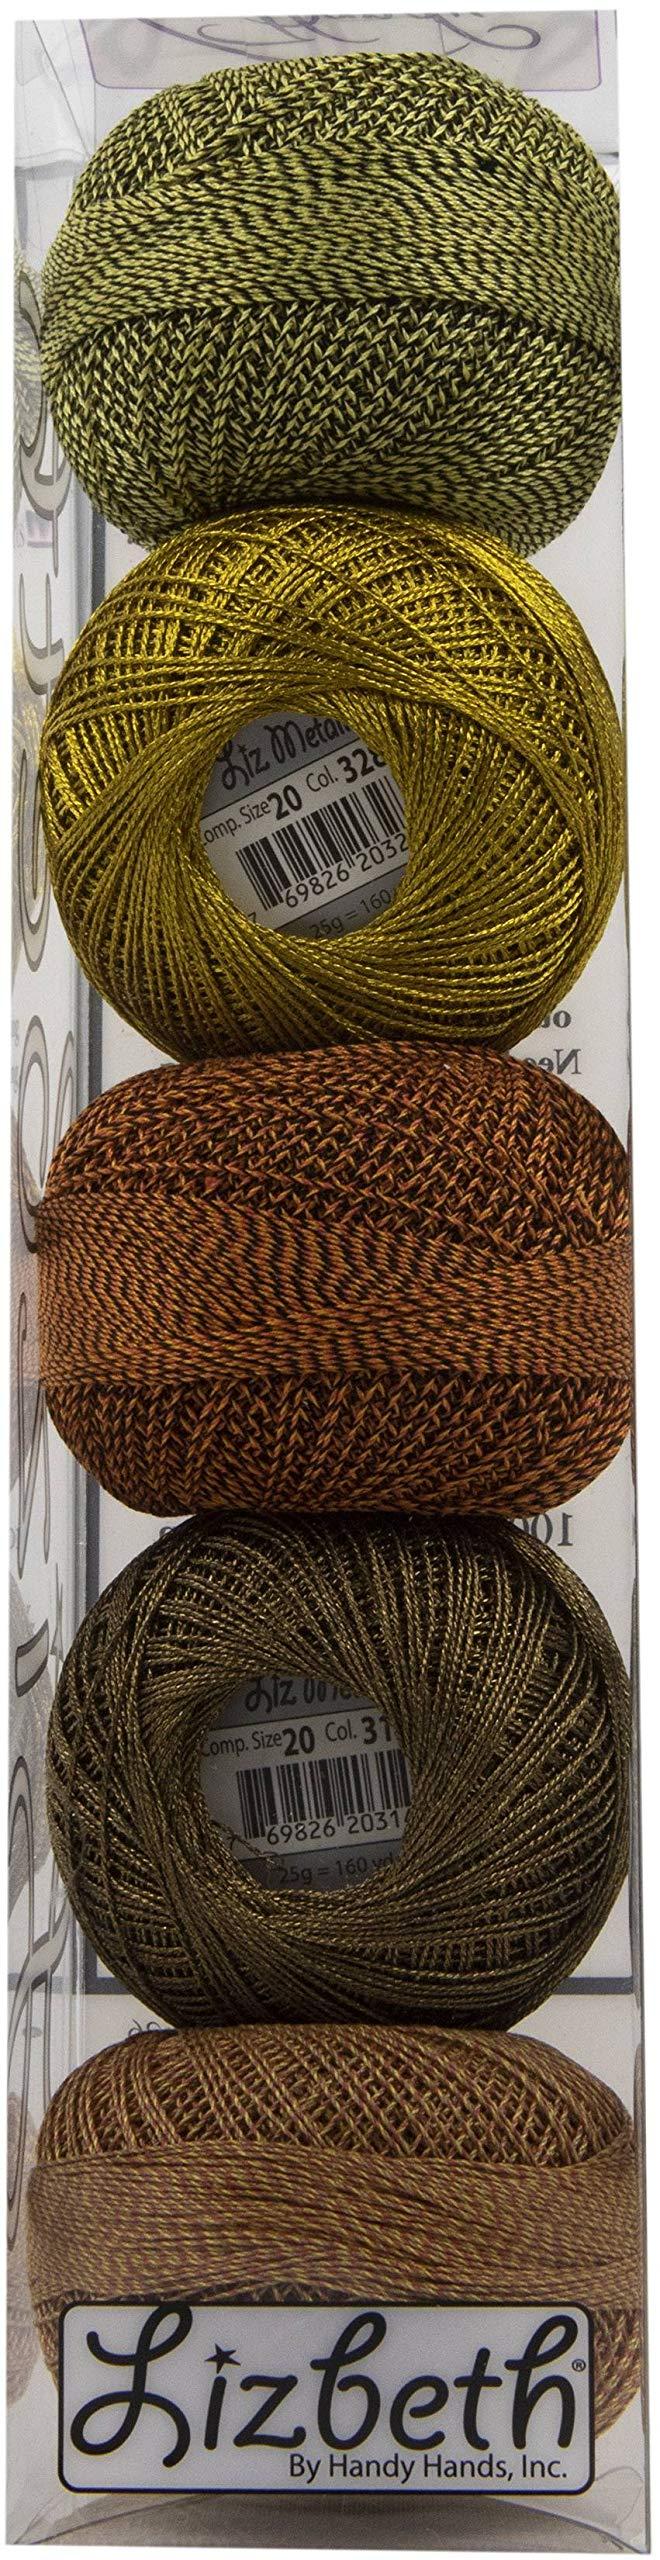 Handy Hands DP7207 Lizbeth Size 20 Metallic & Crochet Cotton Pack-Octoberfest 5/Pkg